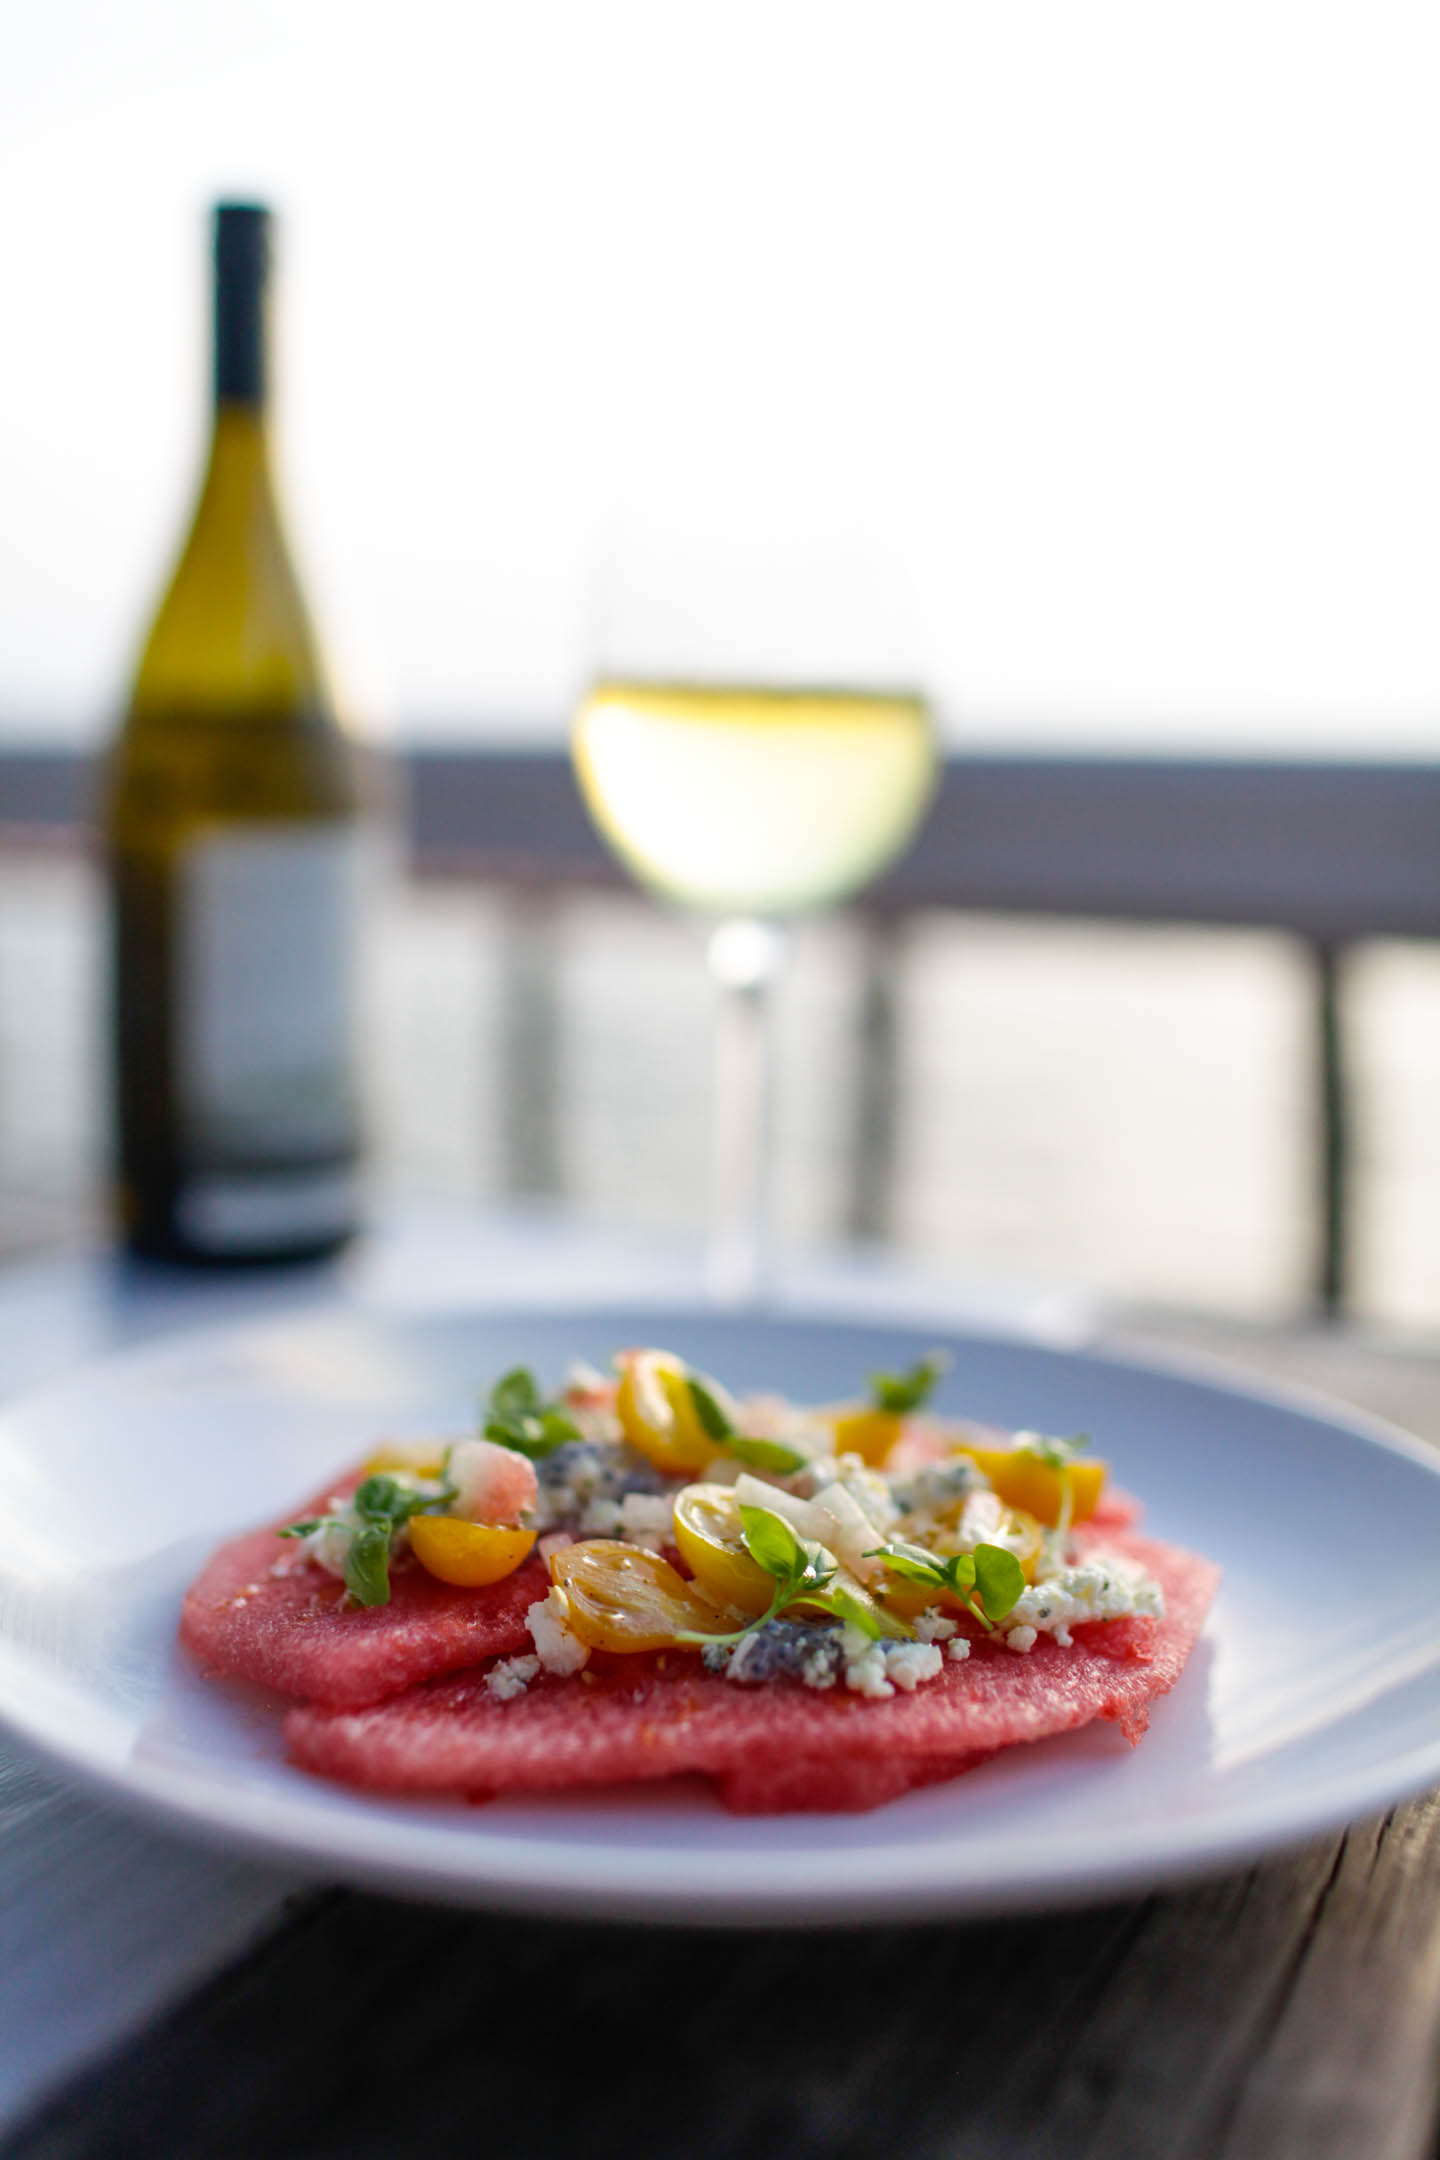 striffler-photography-lifestyle-food-Hamptons-9.jpg